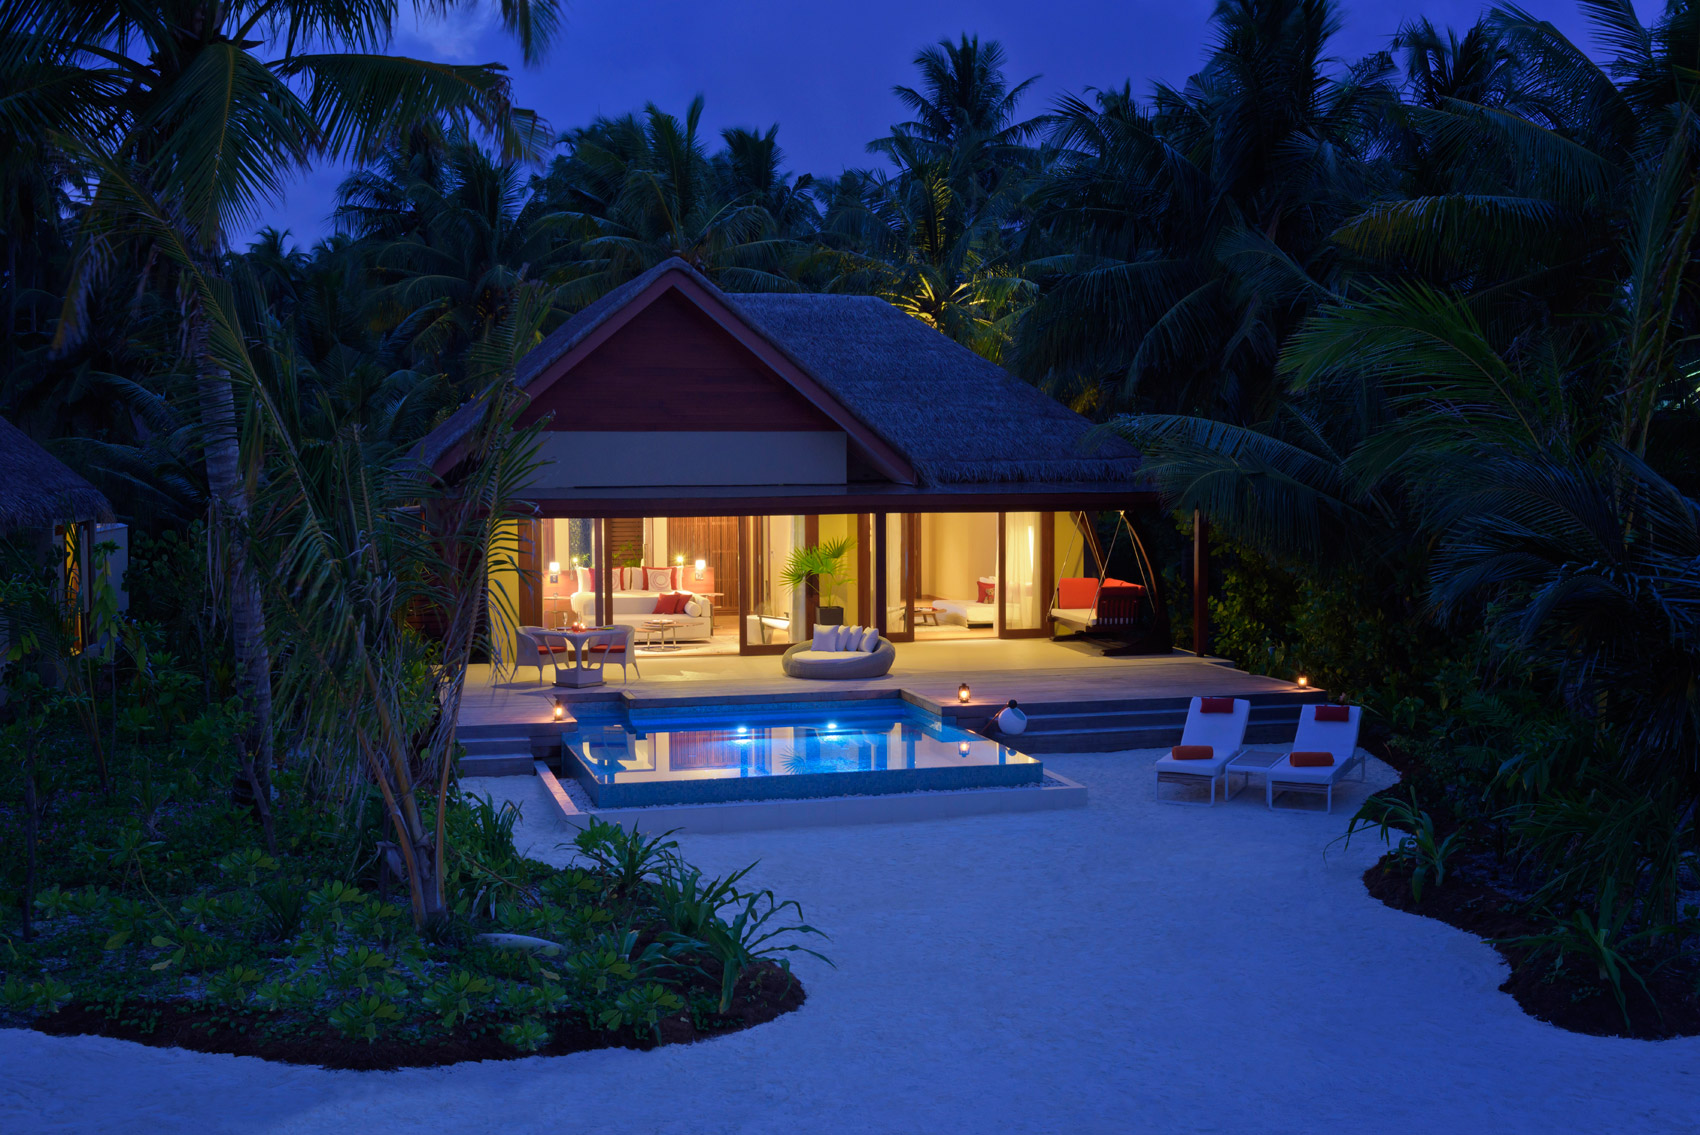 Spotlight On The Maldives - The Luxurious Niyama Experience 8